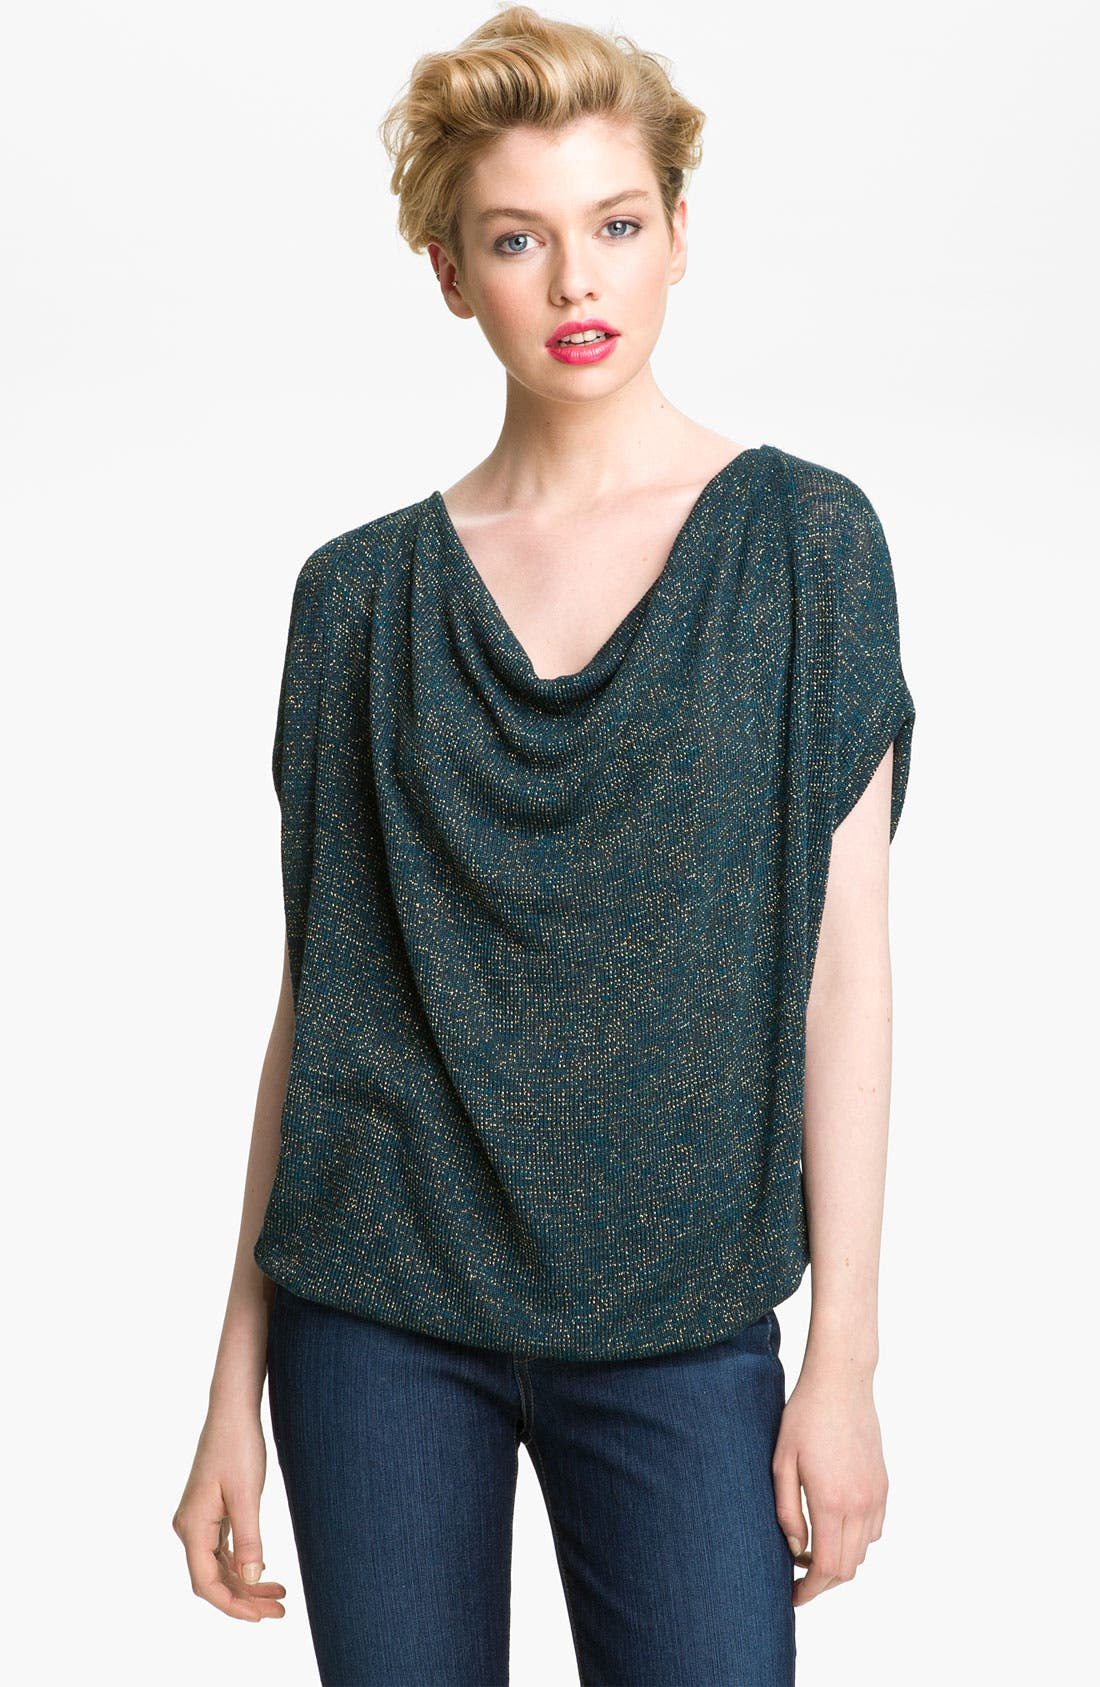 Main Image - Ella Moss Metallic Knit Top (Nordstrom Exclusive)